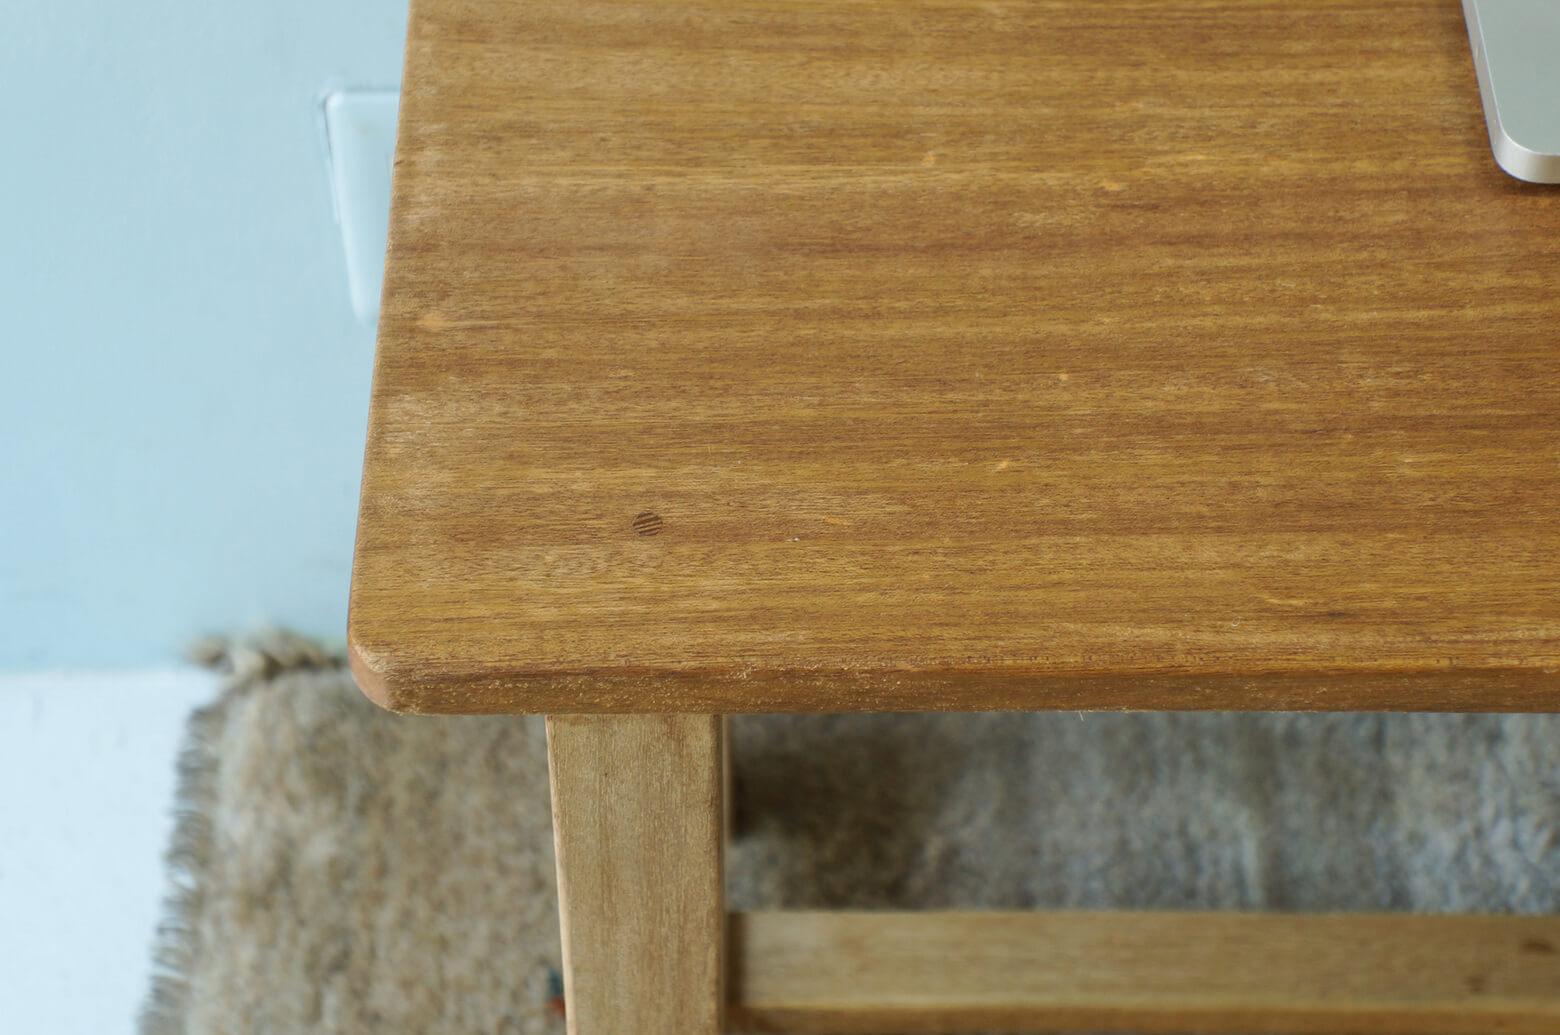 Japanese Vintage Long Work Table/ヴィンテージ 長机 テーブル デスク レトロ シャビー ナチュラル 2